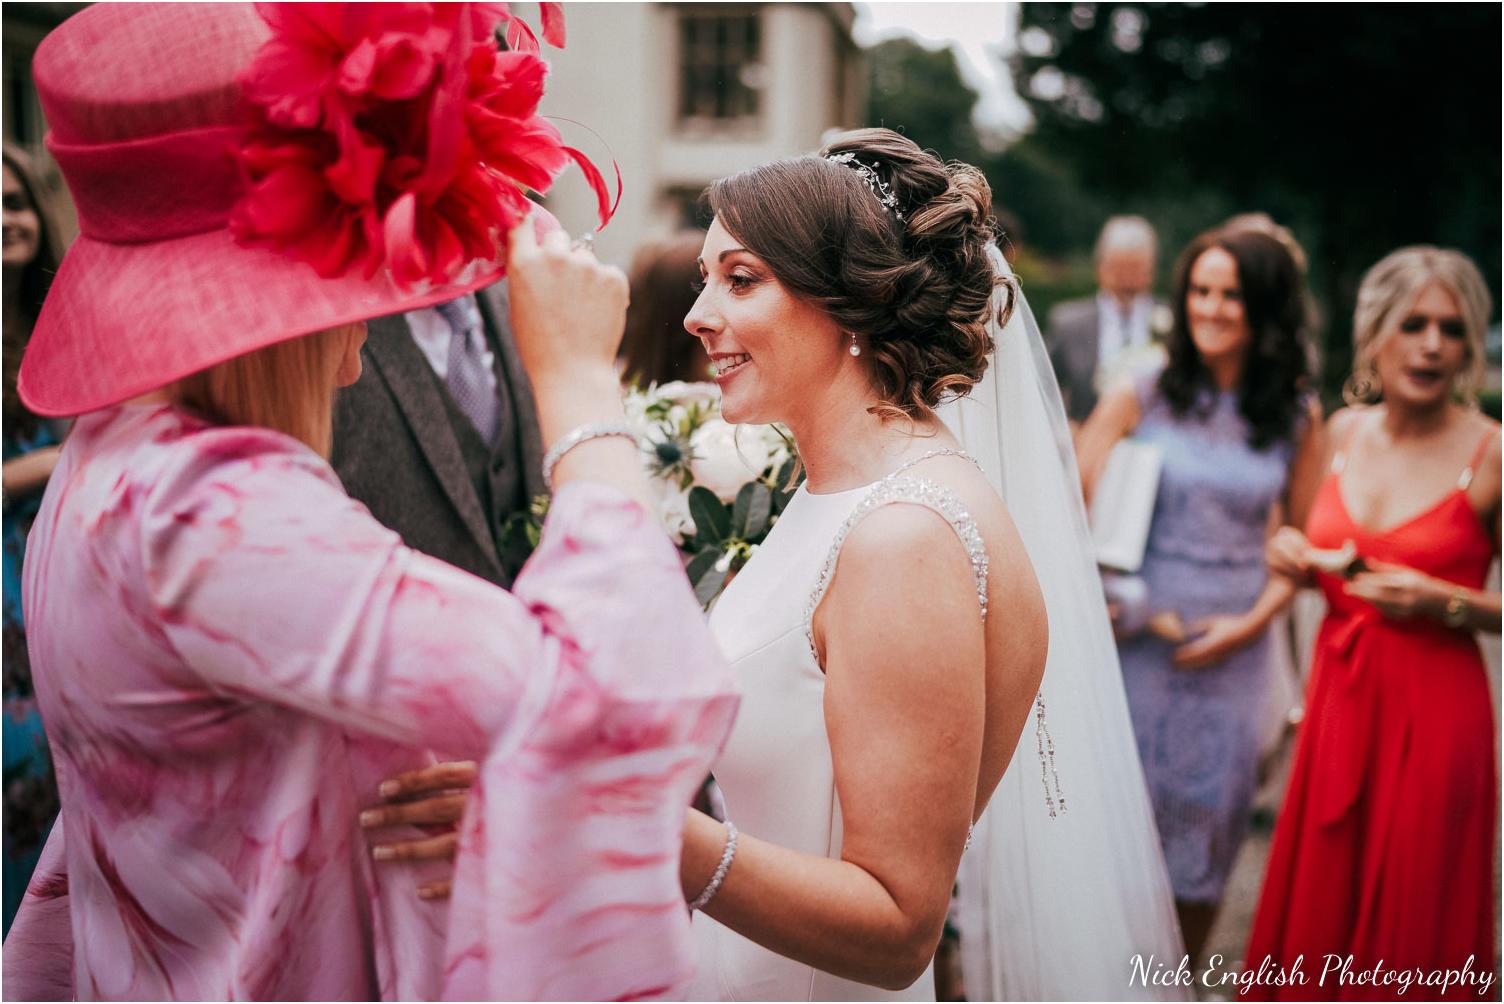 Mitton_Hall_Wedding_Summer_Photograph-59.jpg